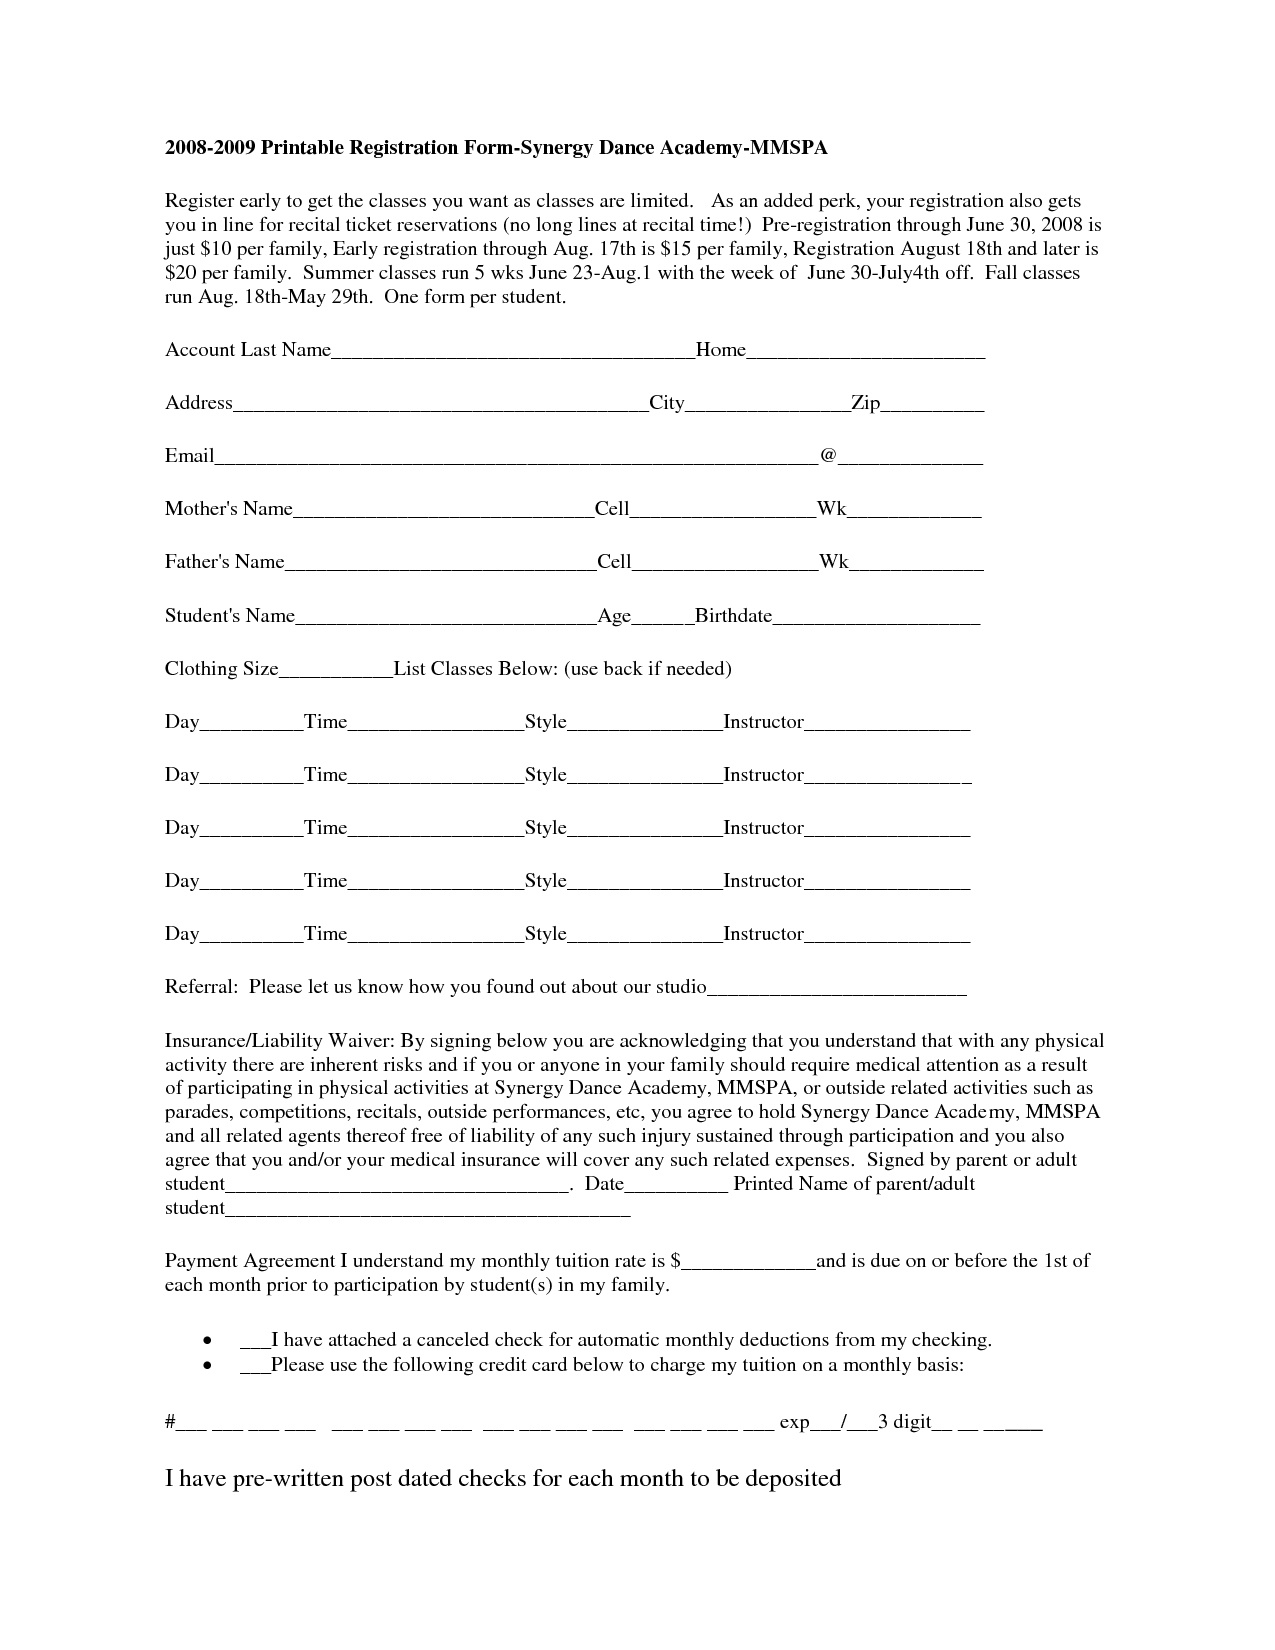 Free Printable Registration Form Template | Shop Fresh - Free Printable Membership Forms